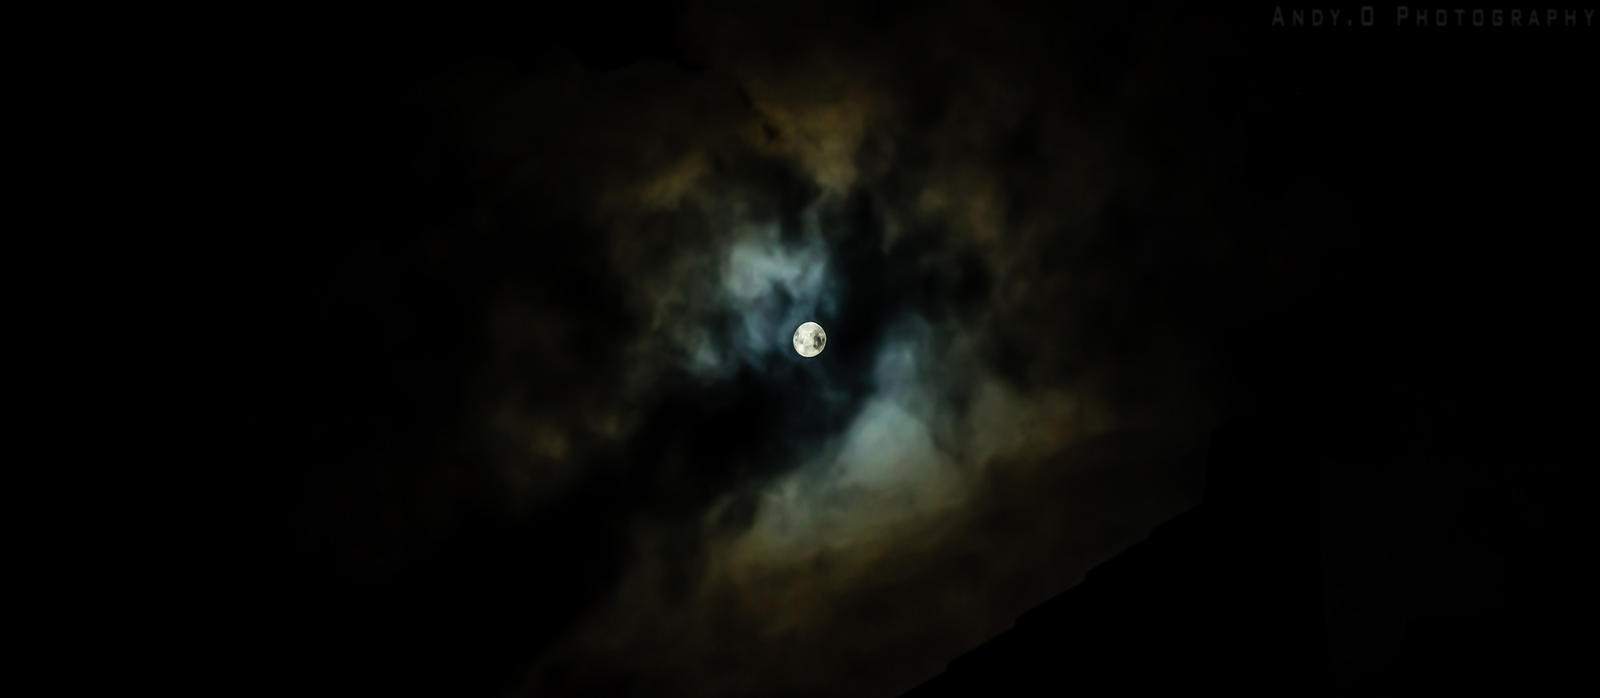 Mystical Moon by TakoroMisashi